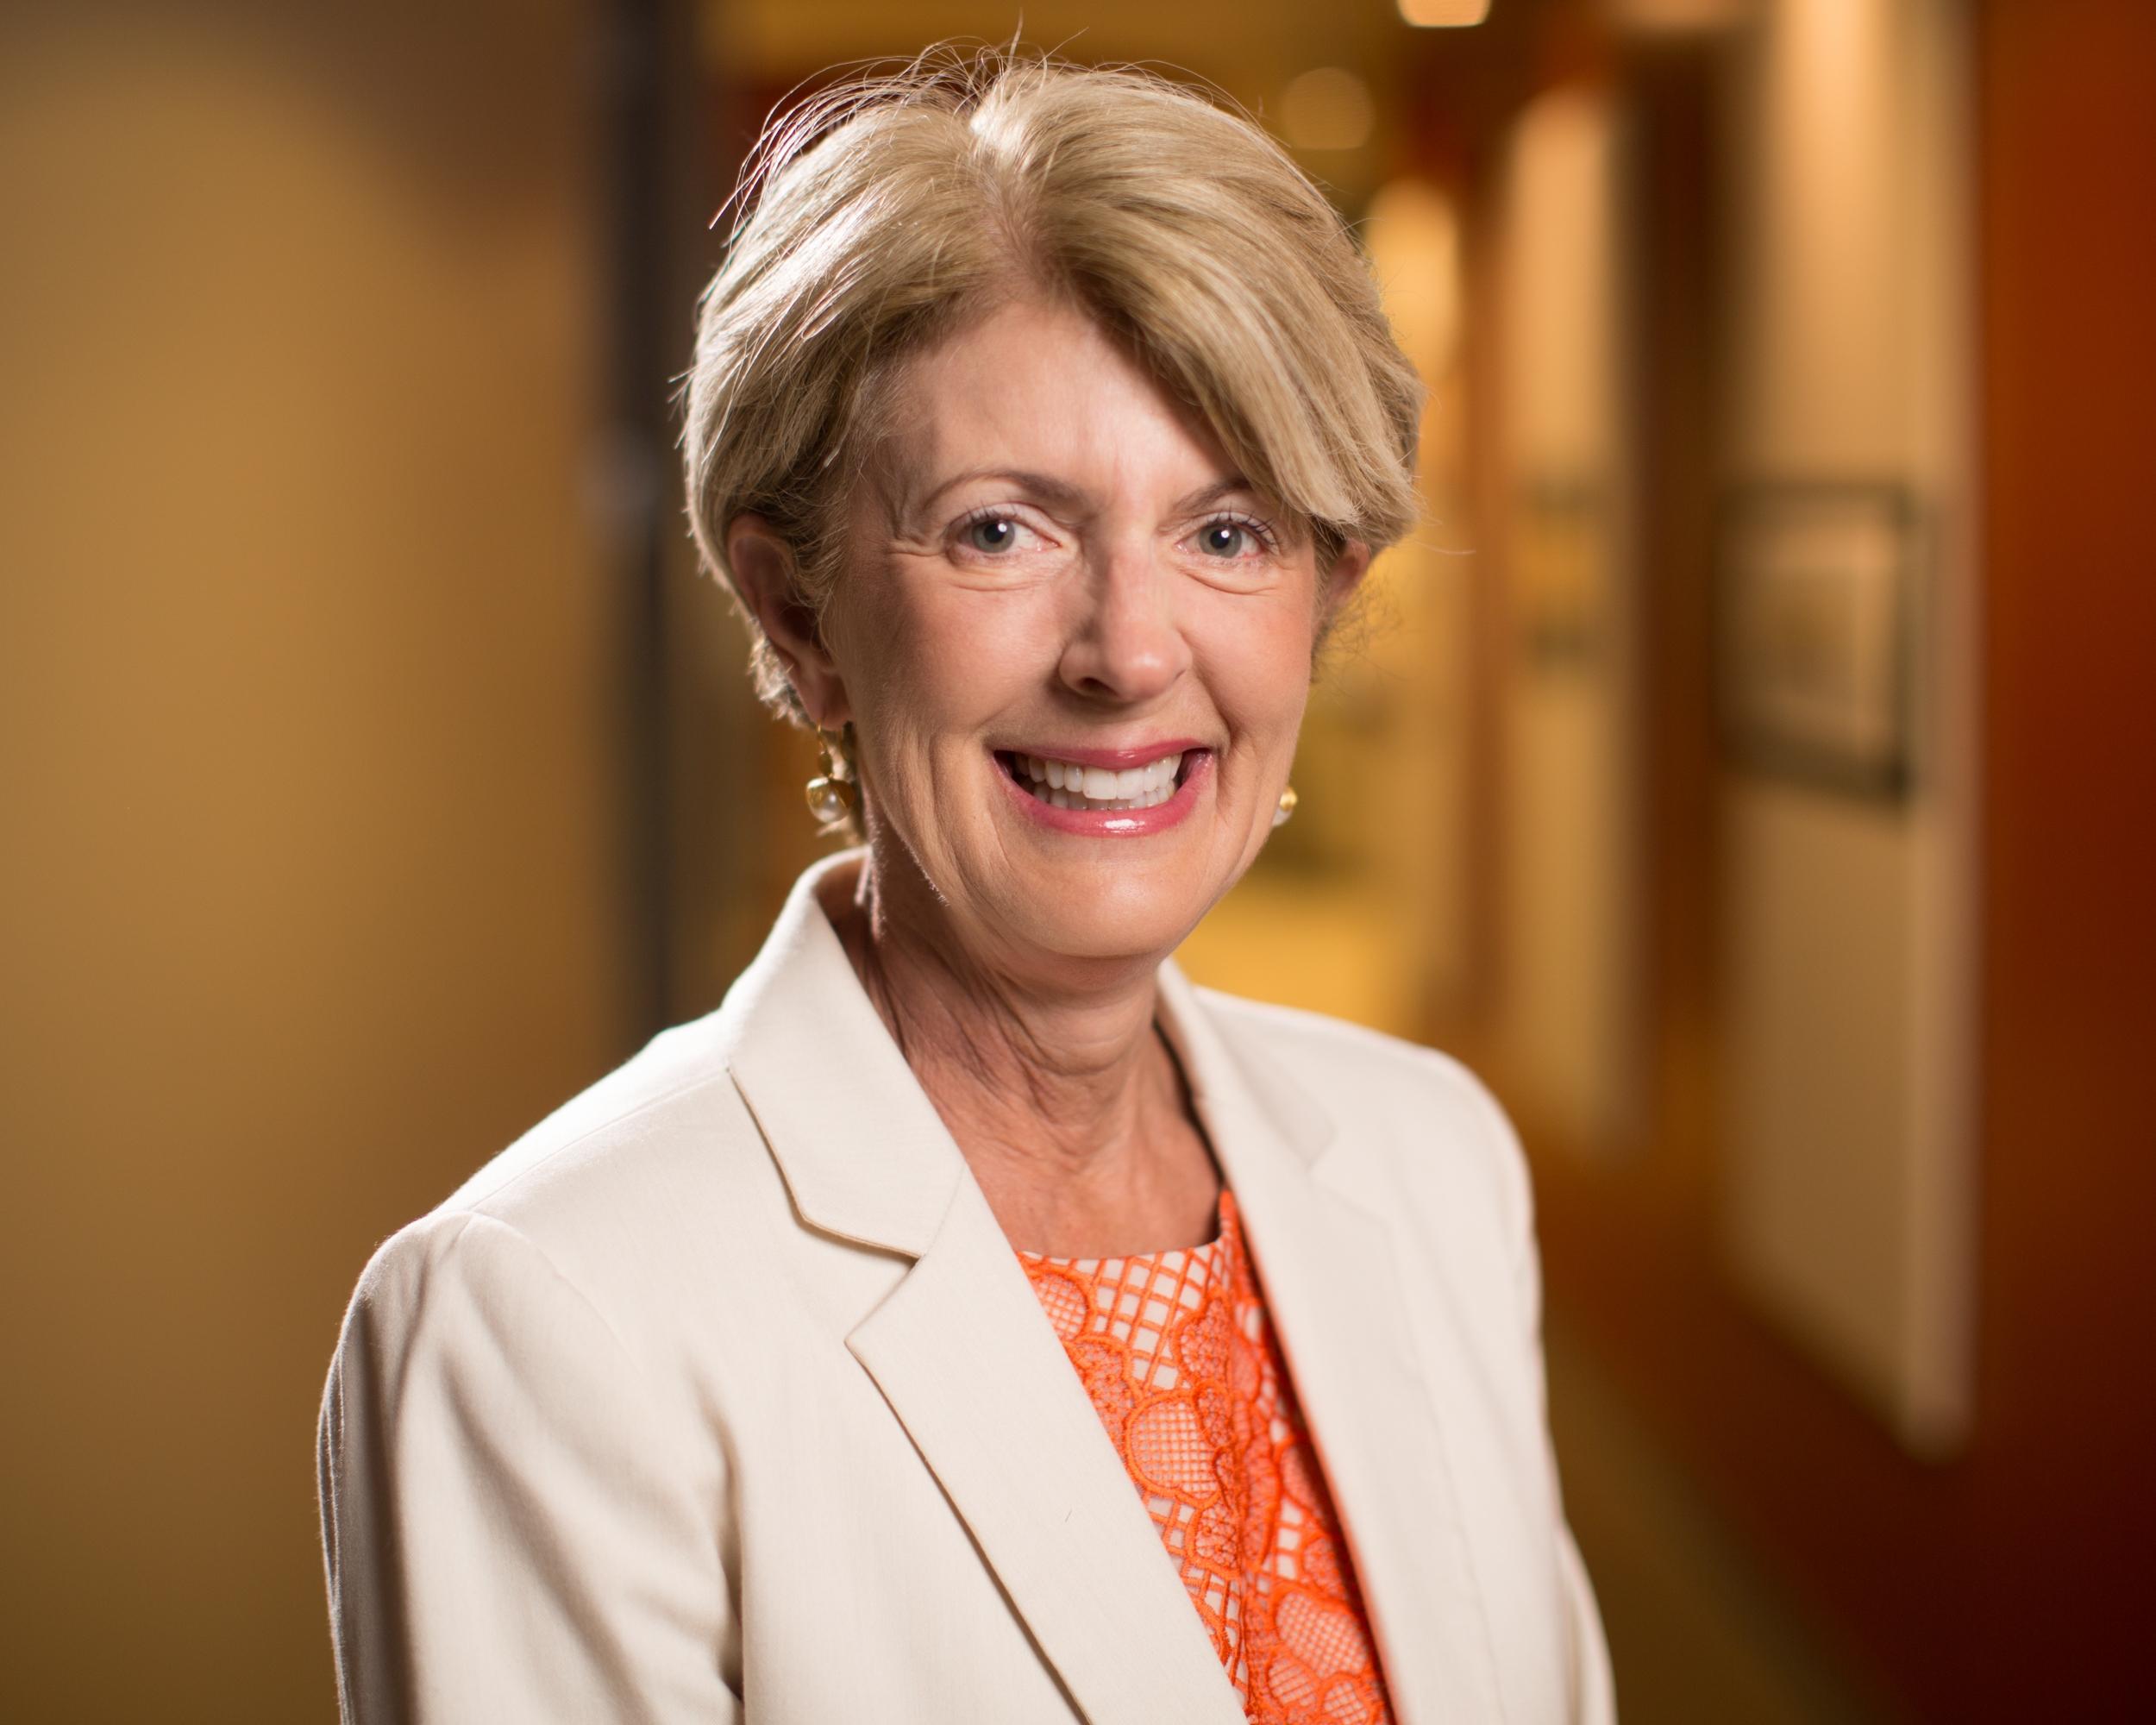 Sandy Hostetter, President, C. Florida Valley National Bank